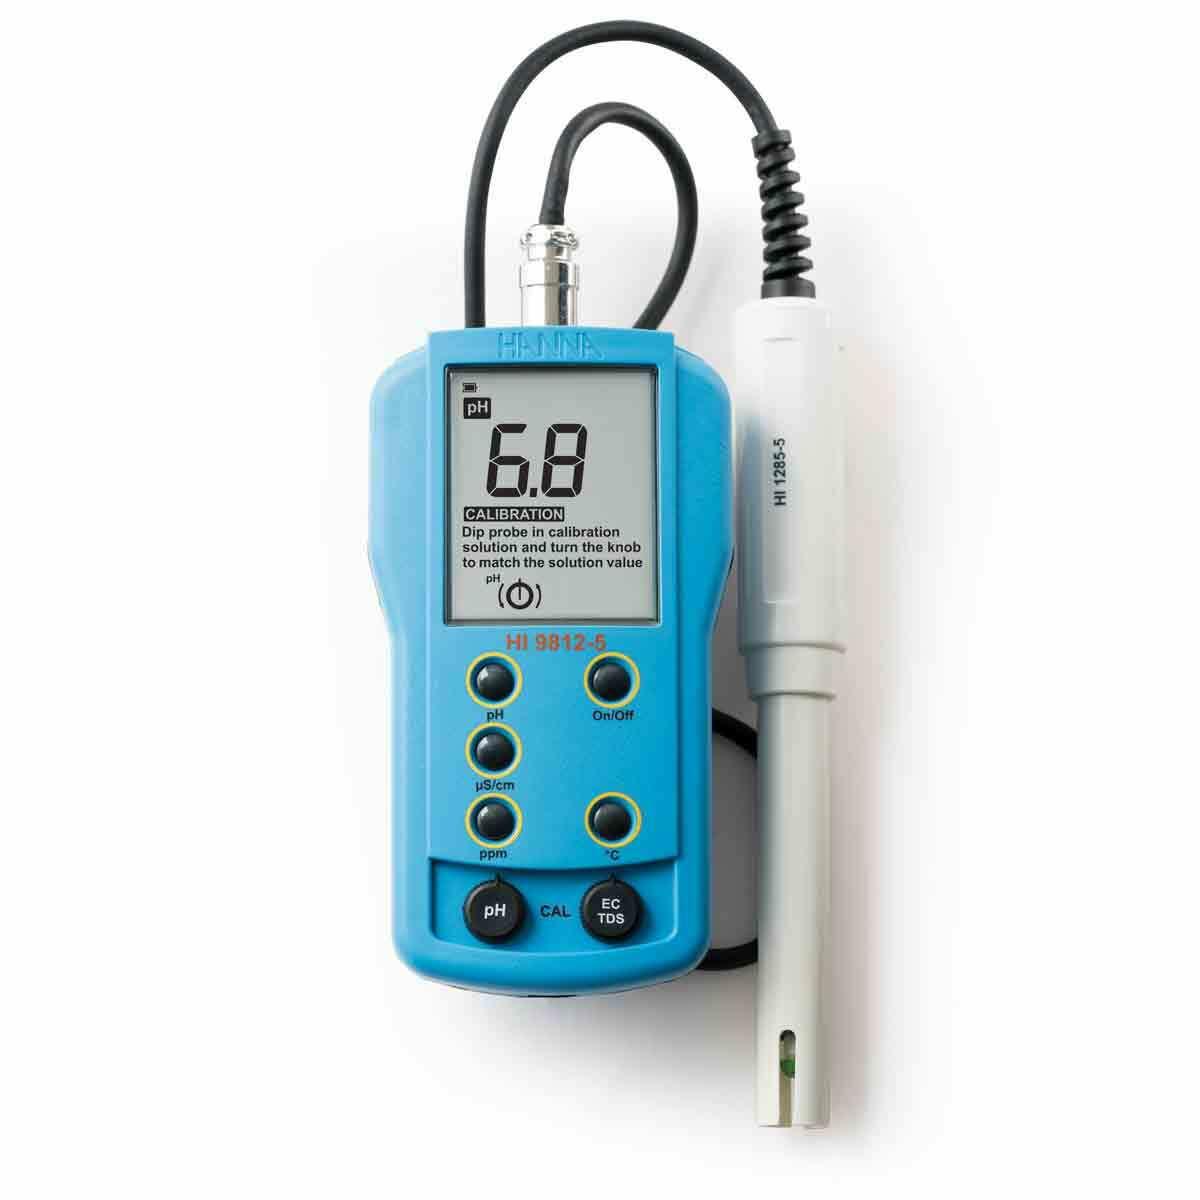 pH/EC/TDS/ متر قابل حمل - HI9812-5